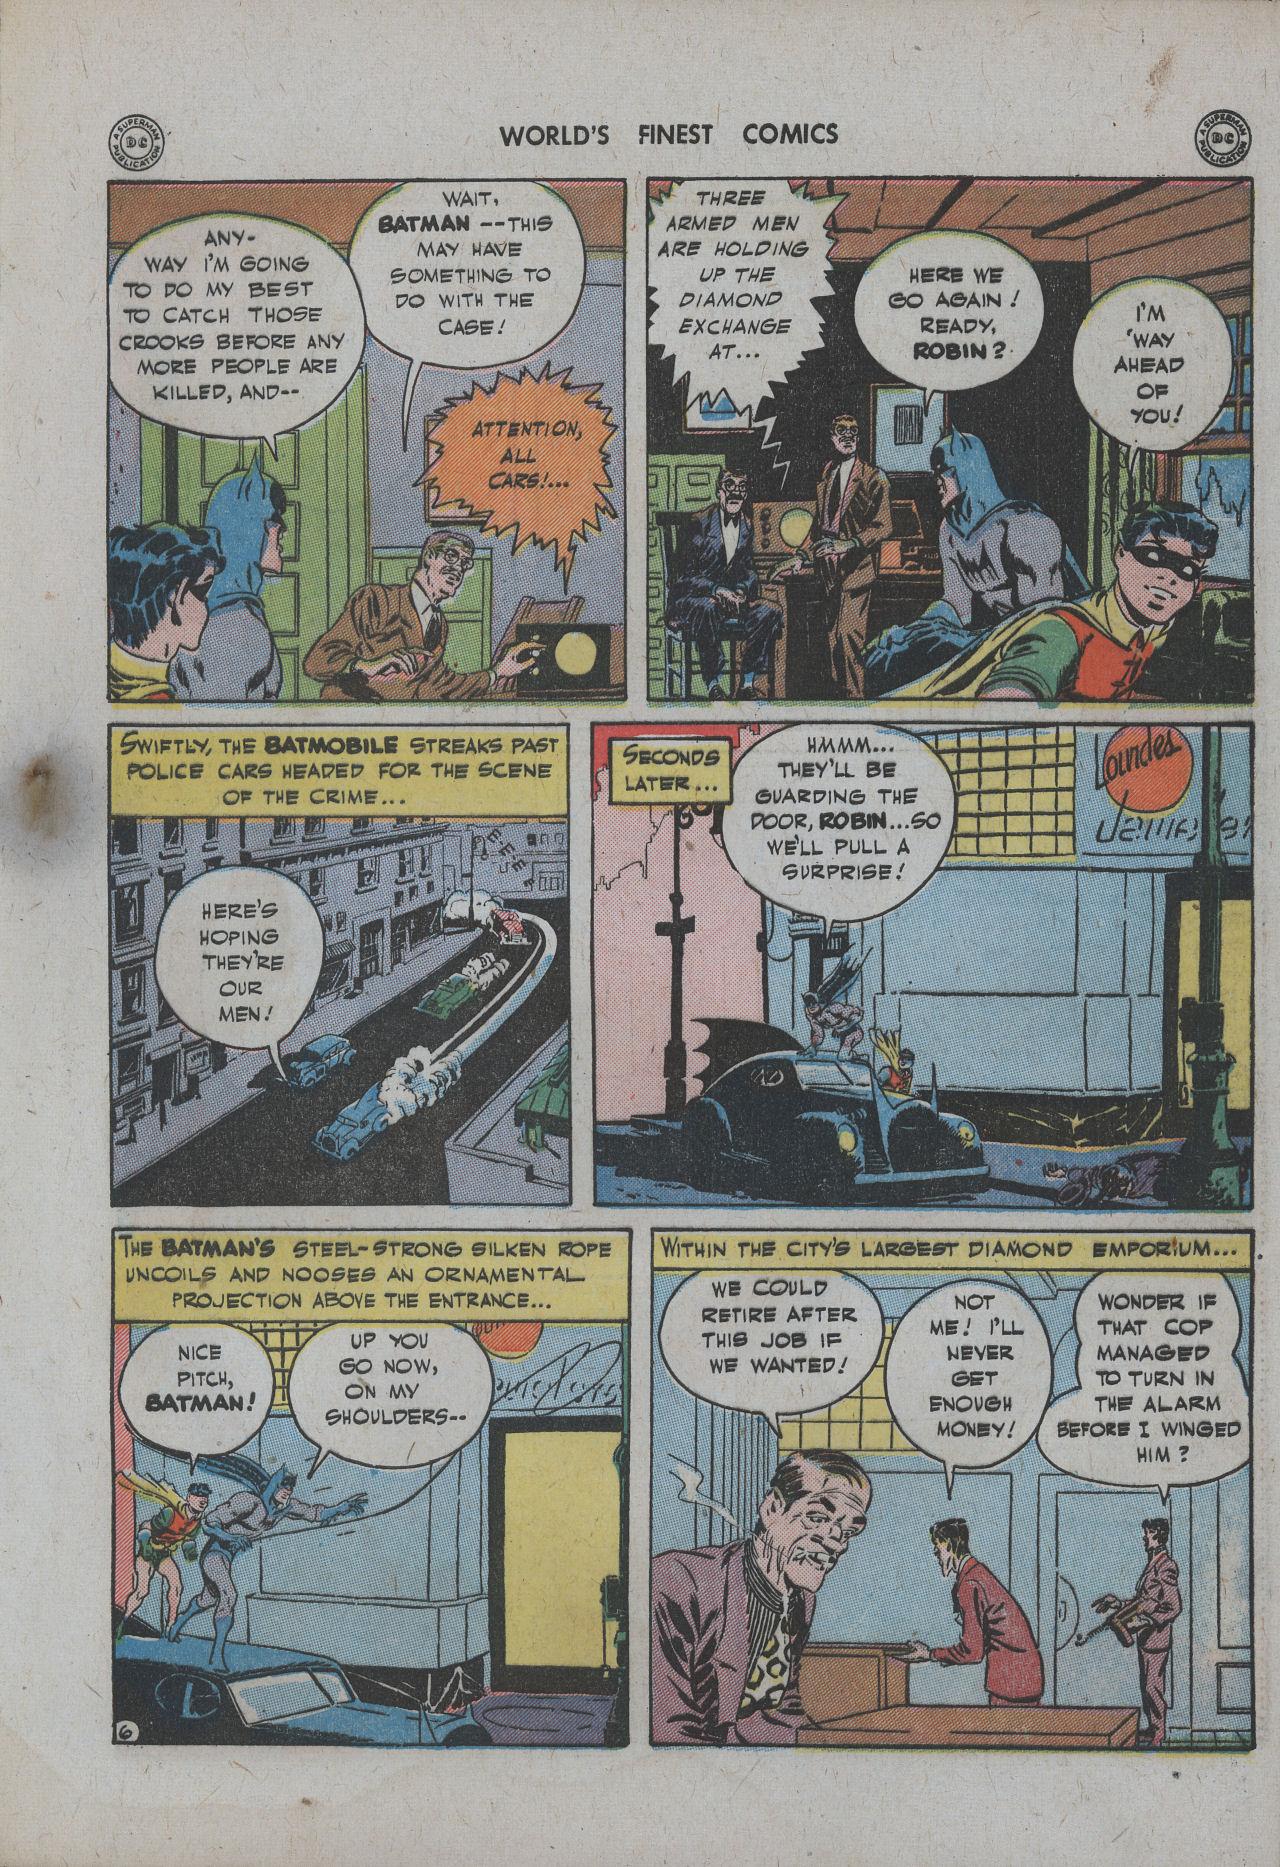 Read online World's Finest Comics comic -  Issue #15 - 76